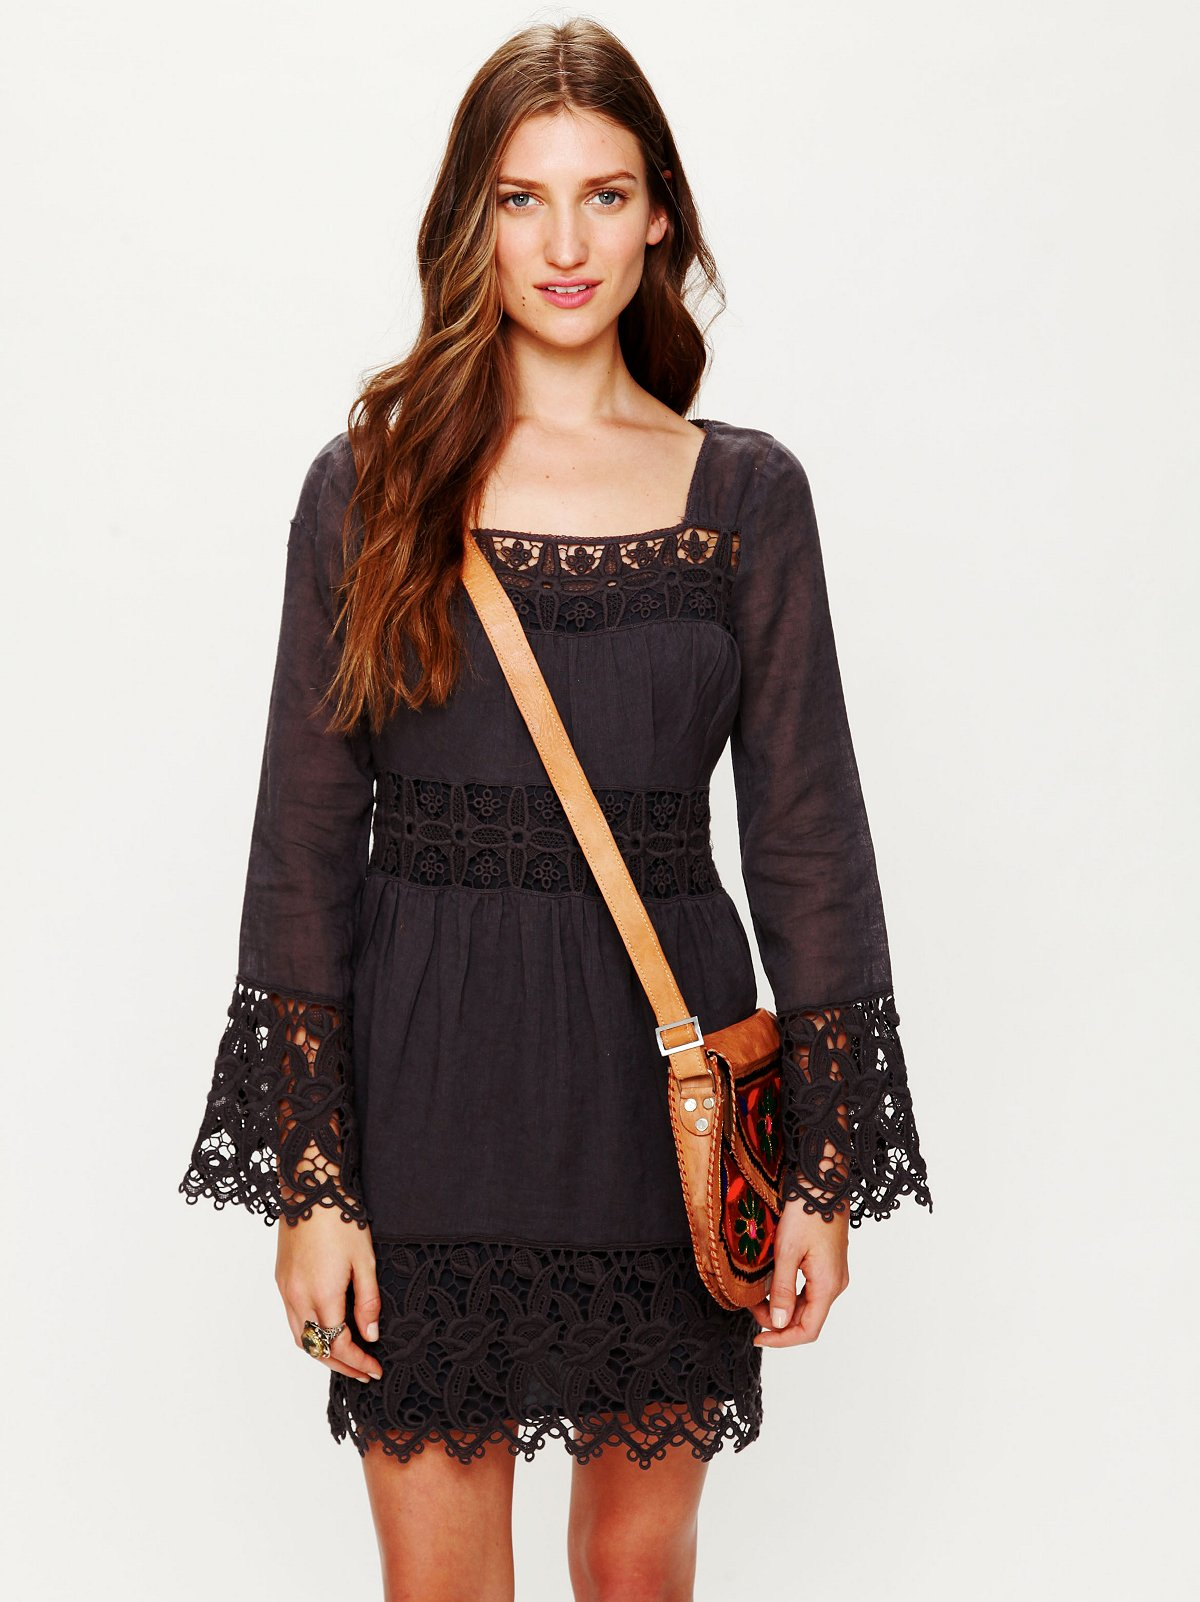 Romantic Insets Dress